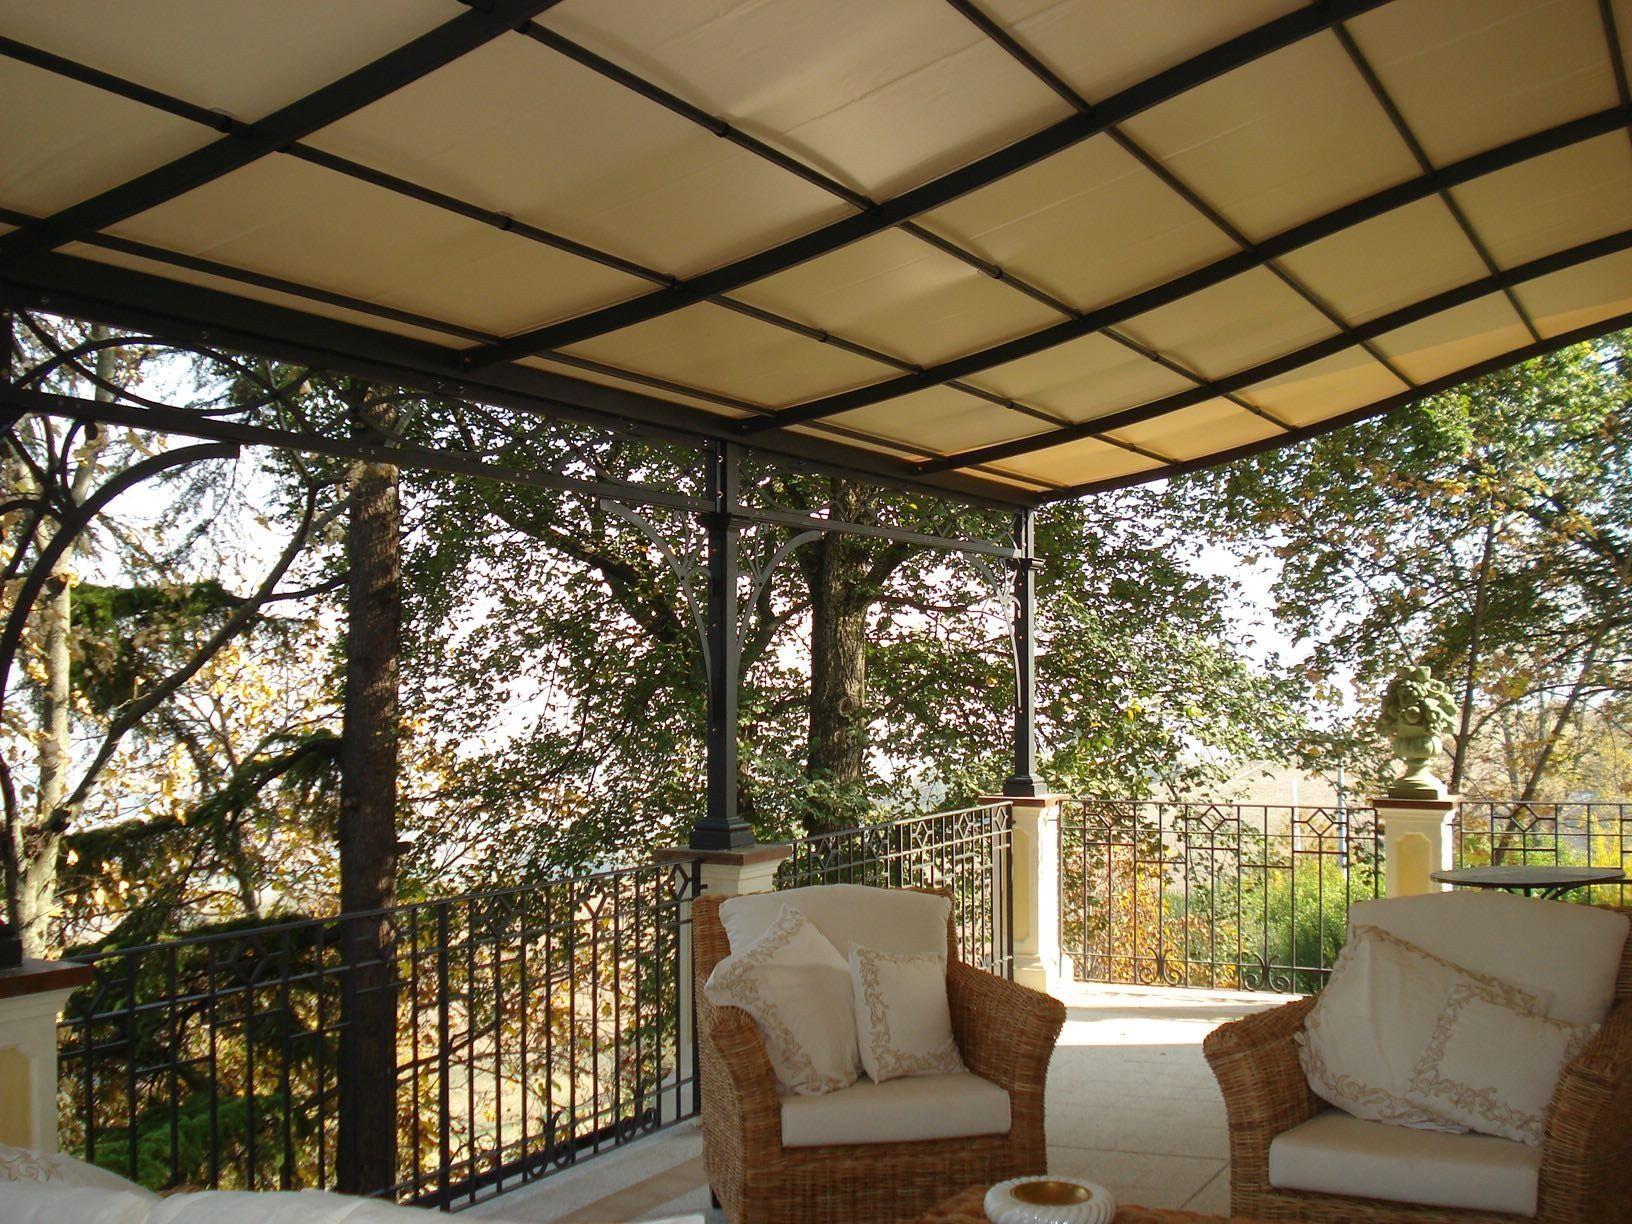 malatesta terrassen berdachung by unosider. Black Bedroom Furniture Sets. Home Design Ideas